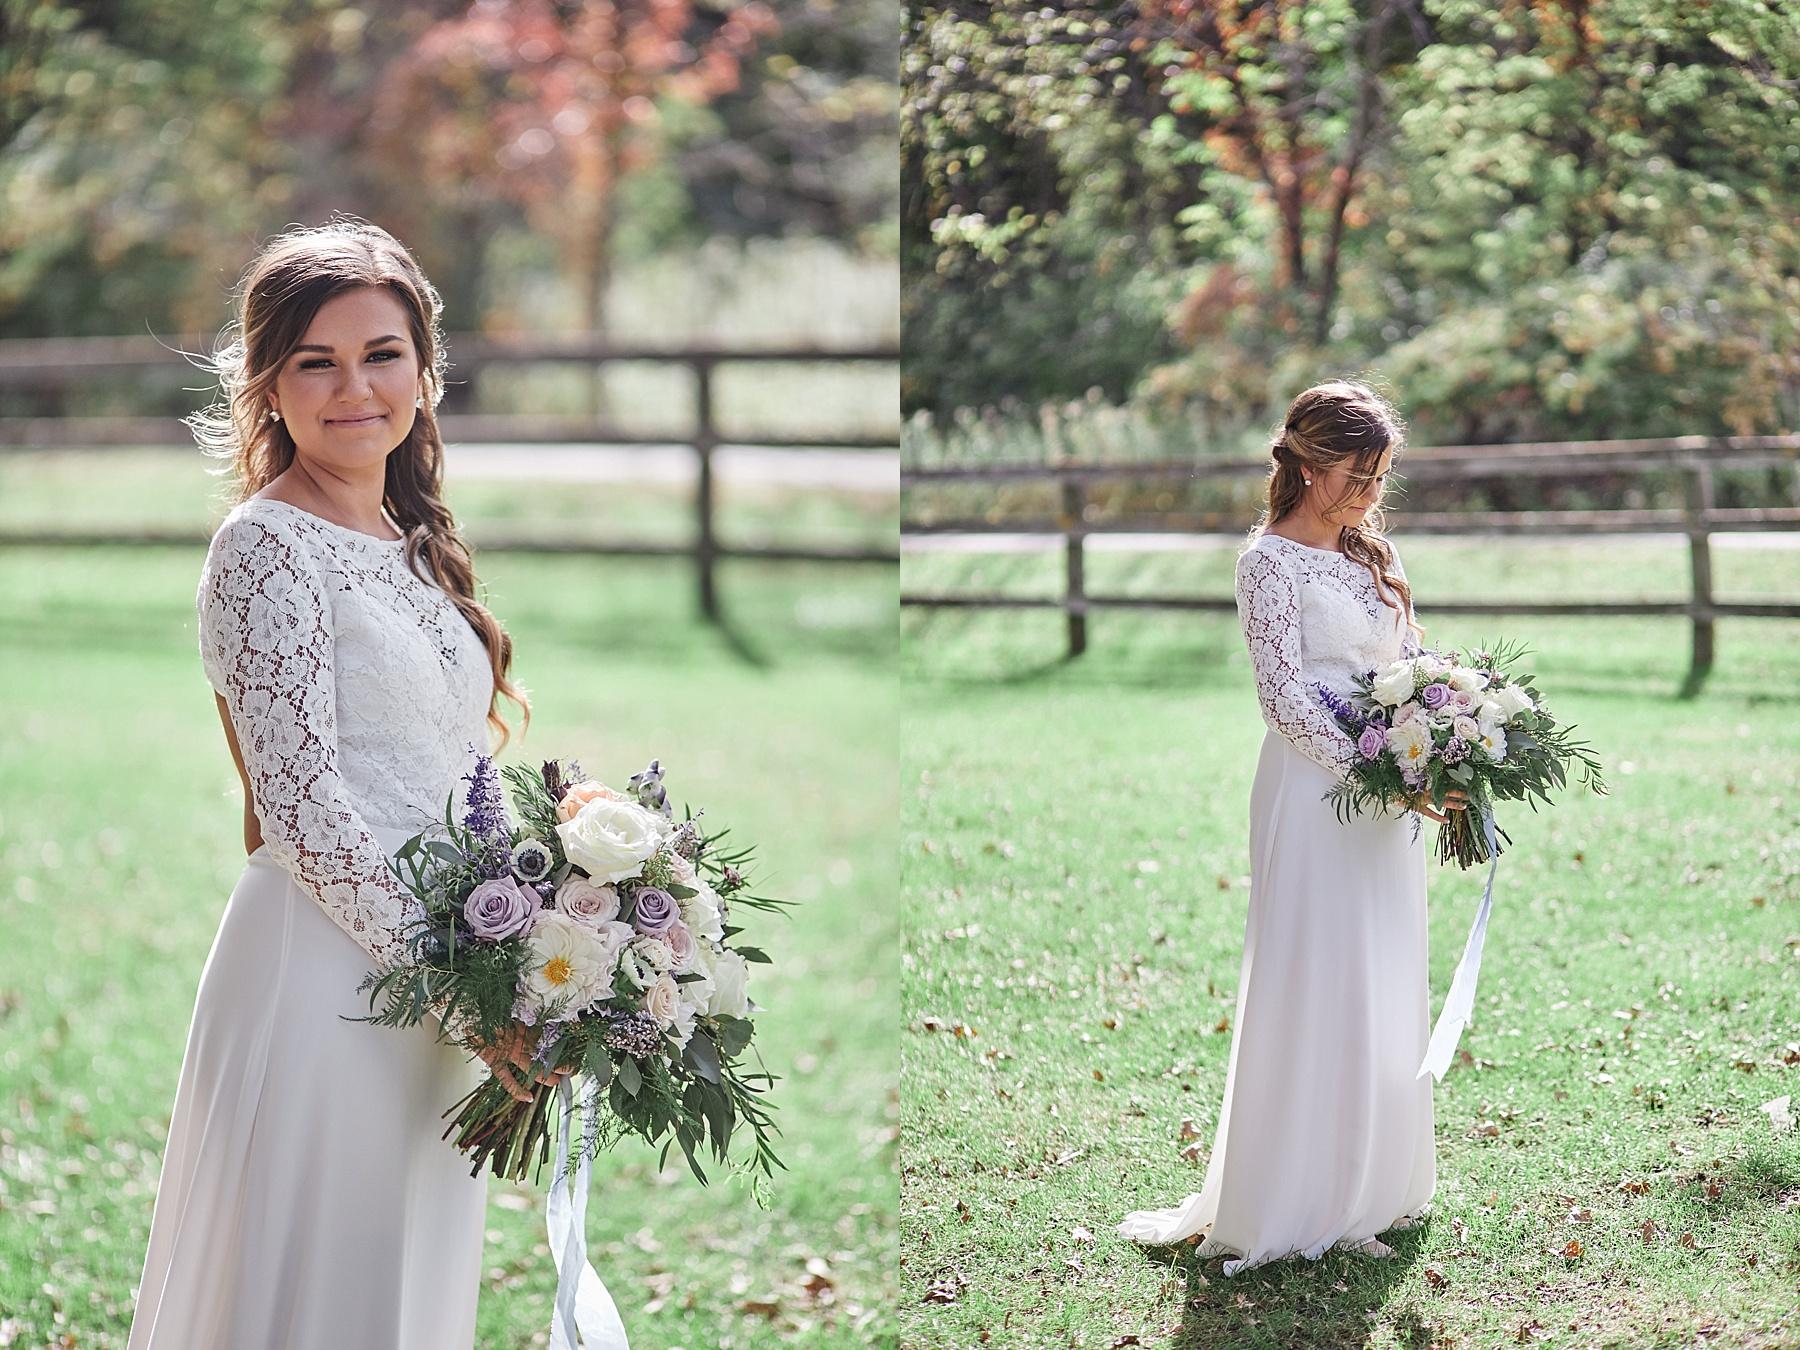 Maywood-Stone-Barn-Wedding-Rochester-Minnesota-Perry-James-Photo_0589.jpg